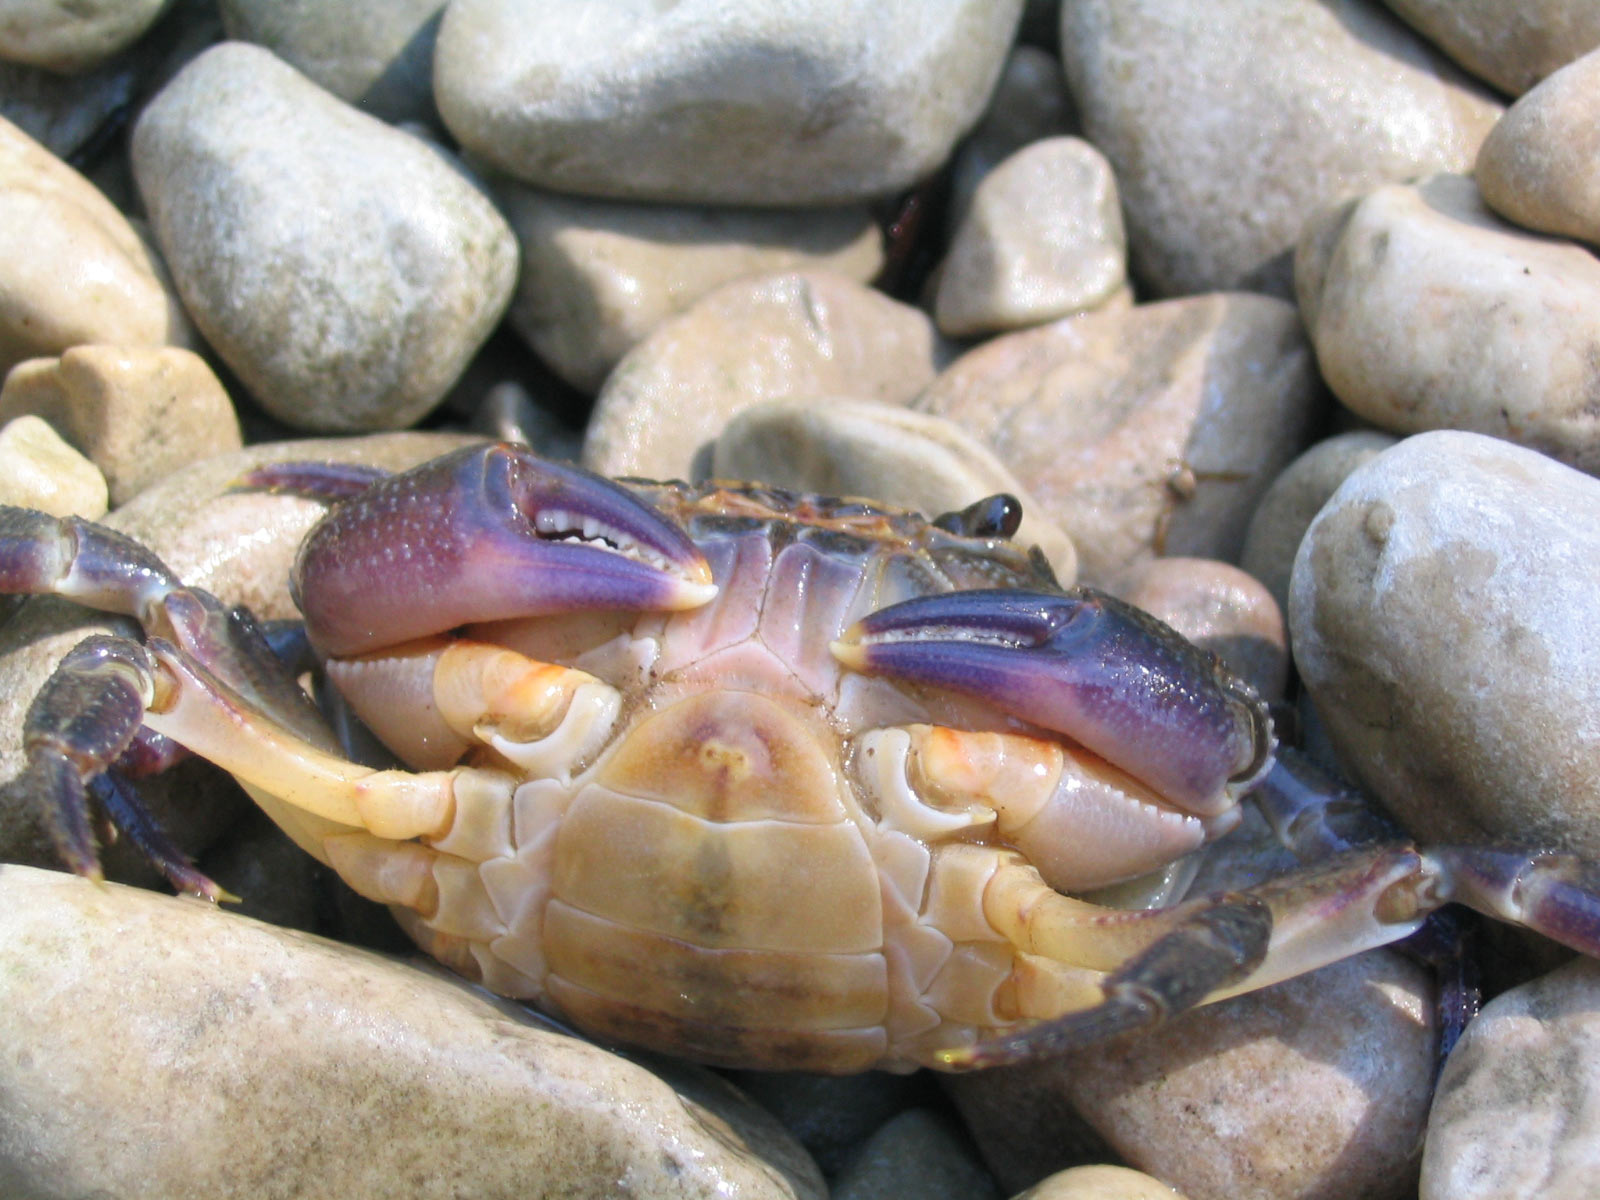 http://4.bp.blogspot.com/_W1VhkUCefIk/S9IjTJW_bDI/AAAAAAAAAJU/mpRCiCRRTjA/s1600/animal_0059.jpg